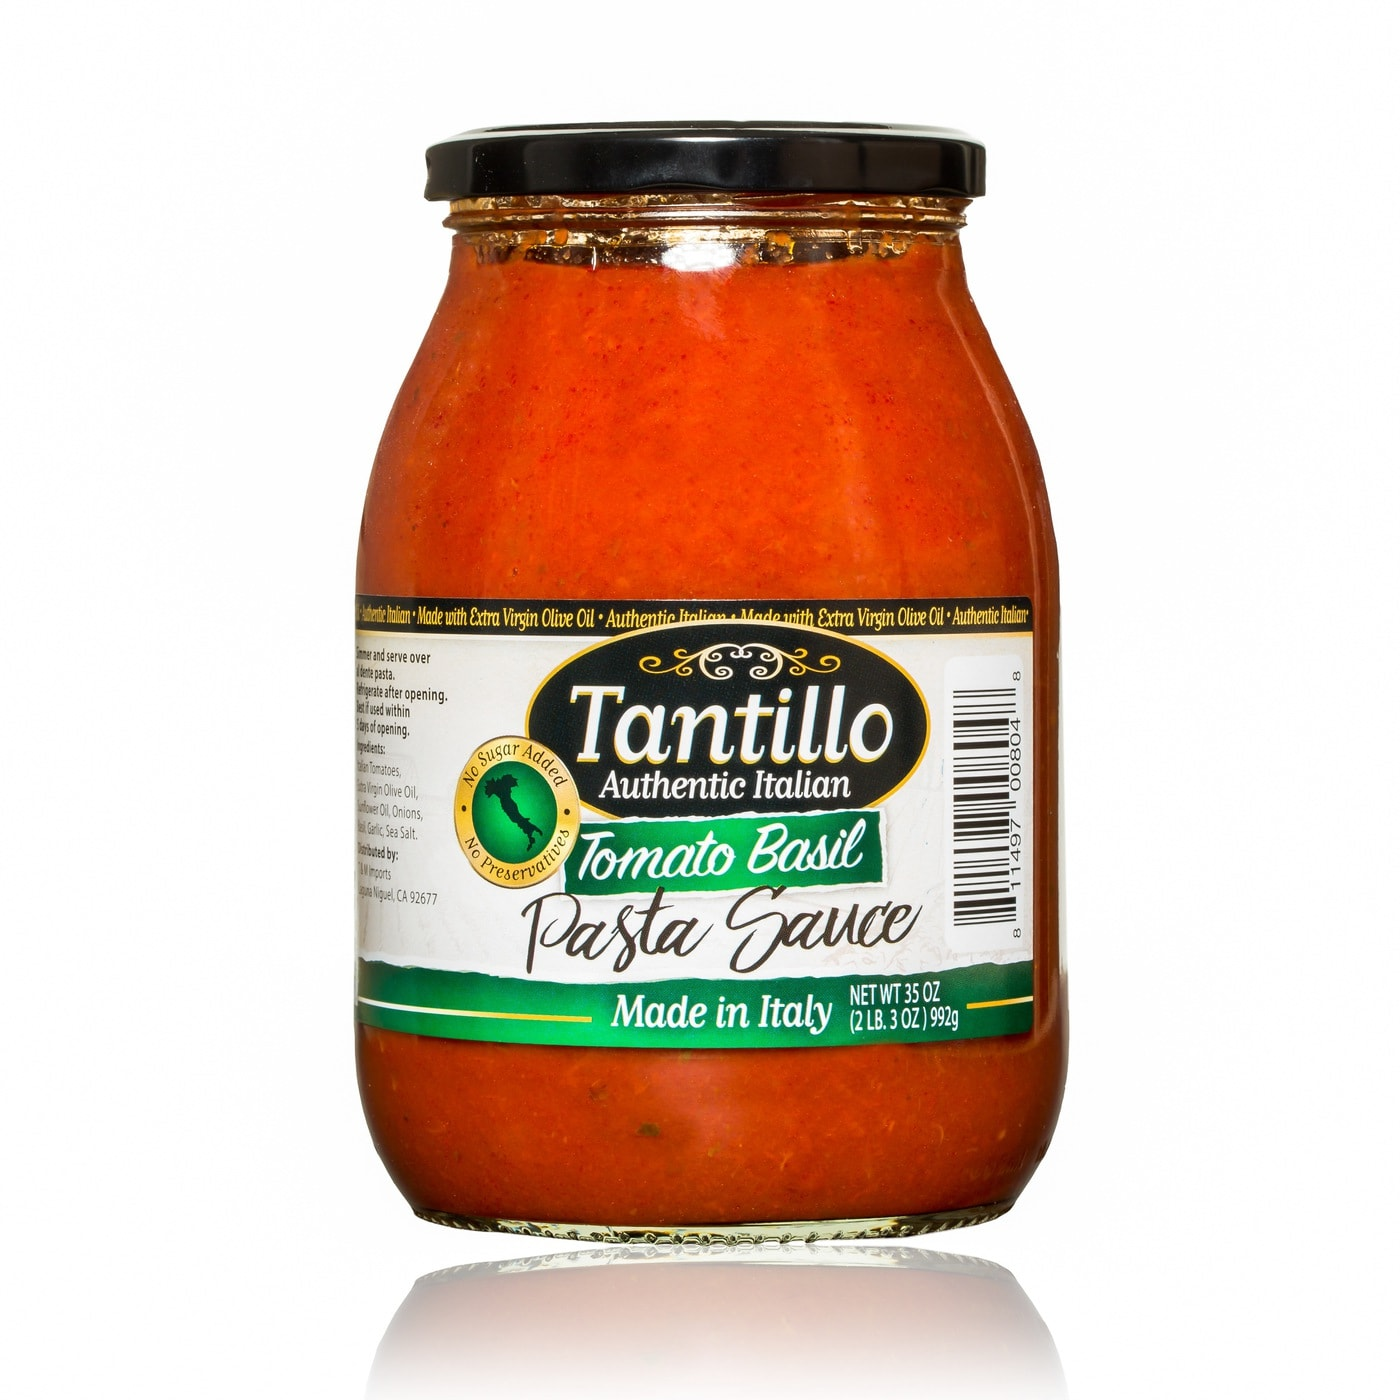 Tantillo Imported Italian Tomato Basil Pasta Sauce